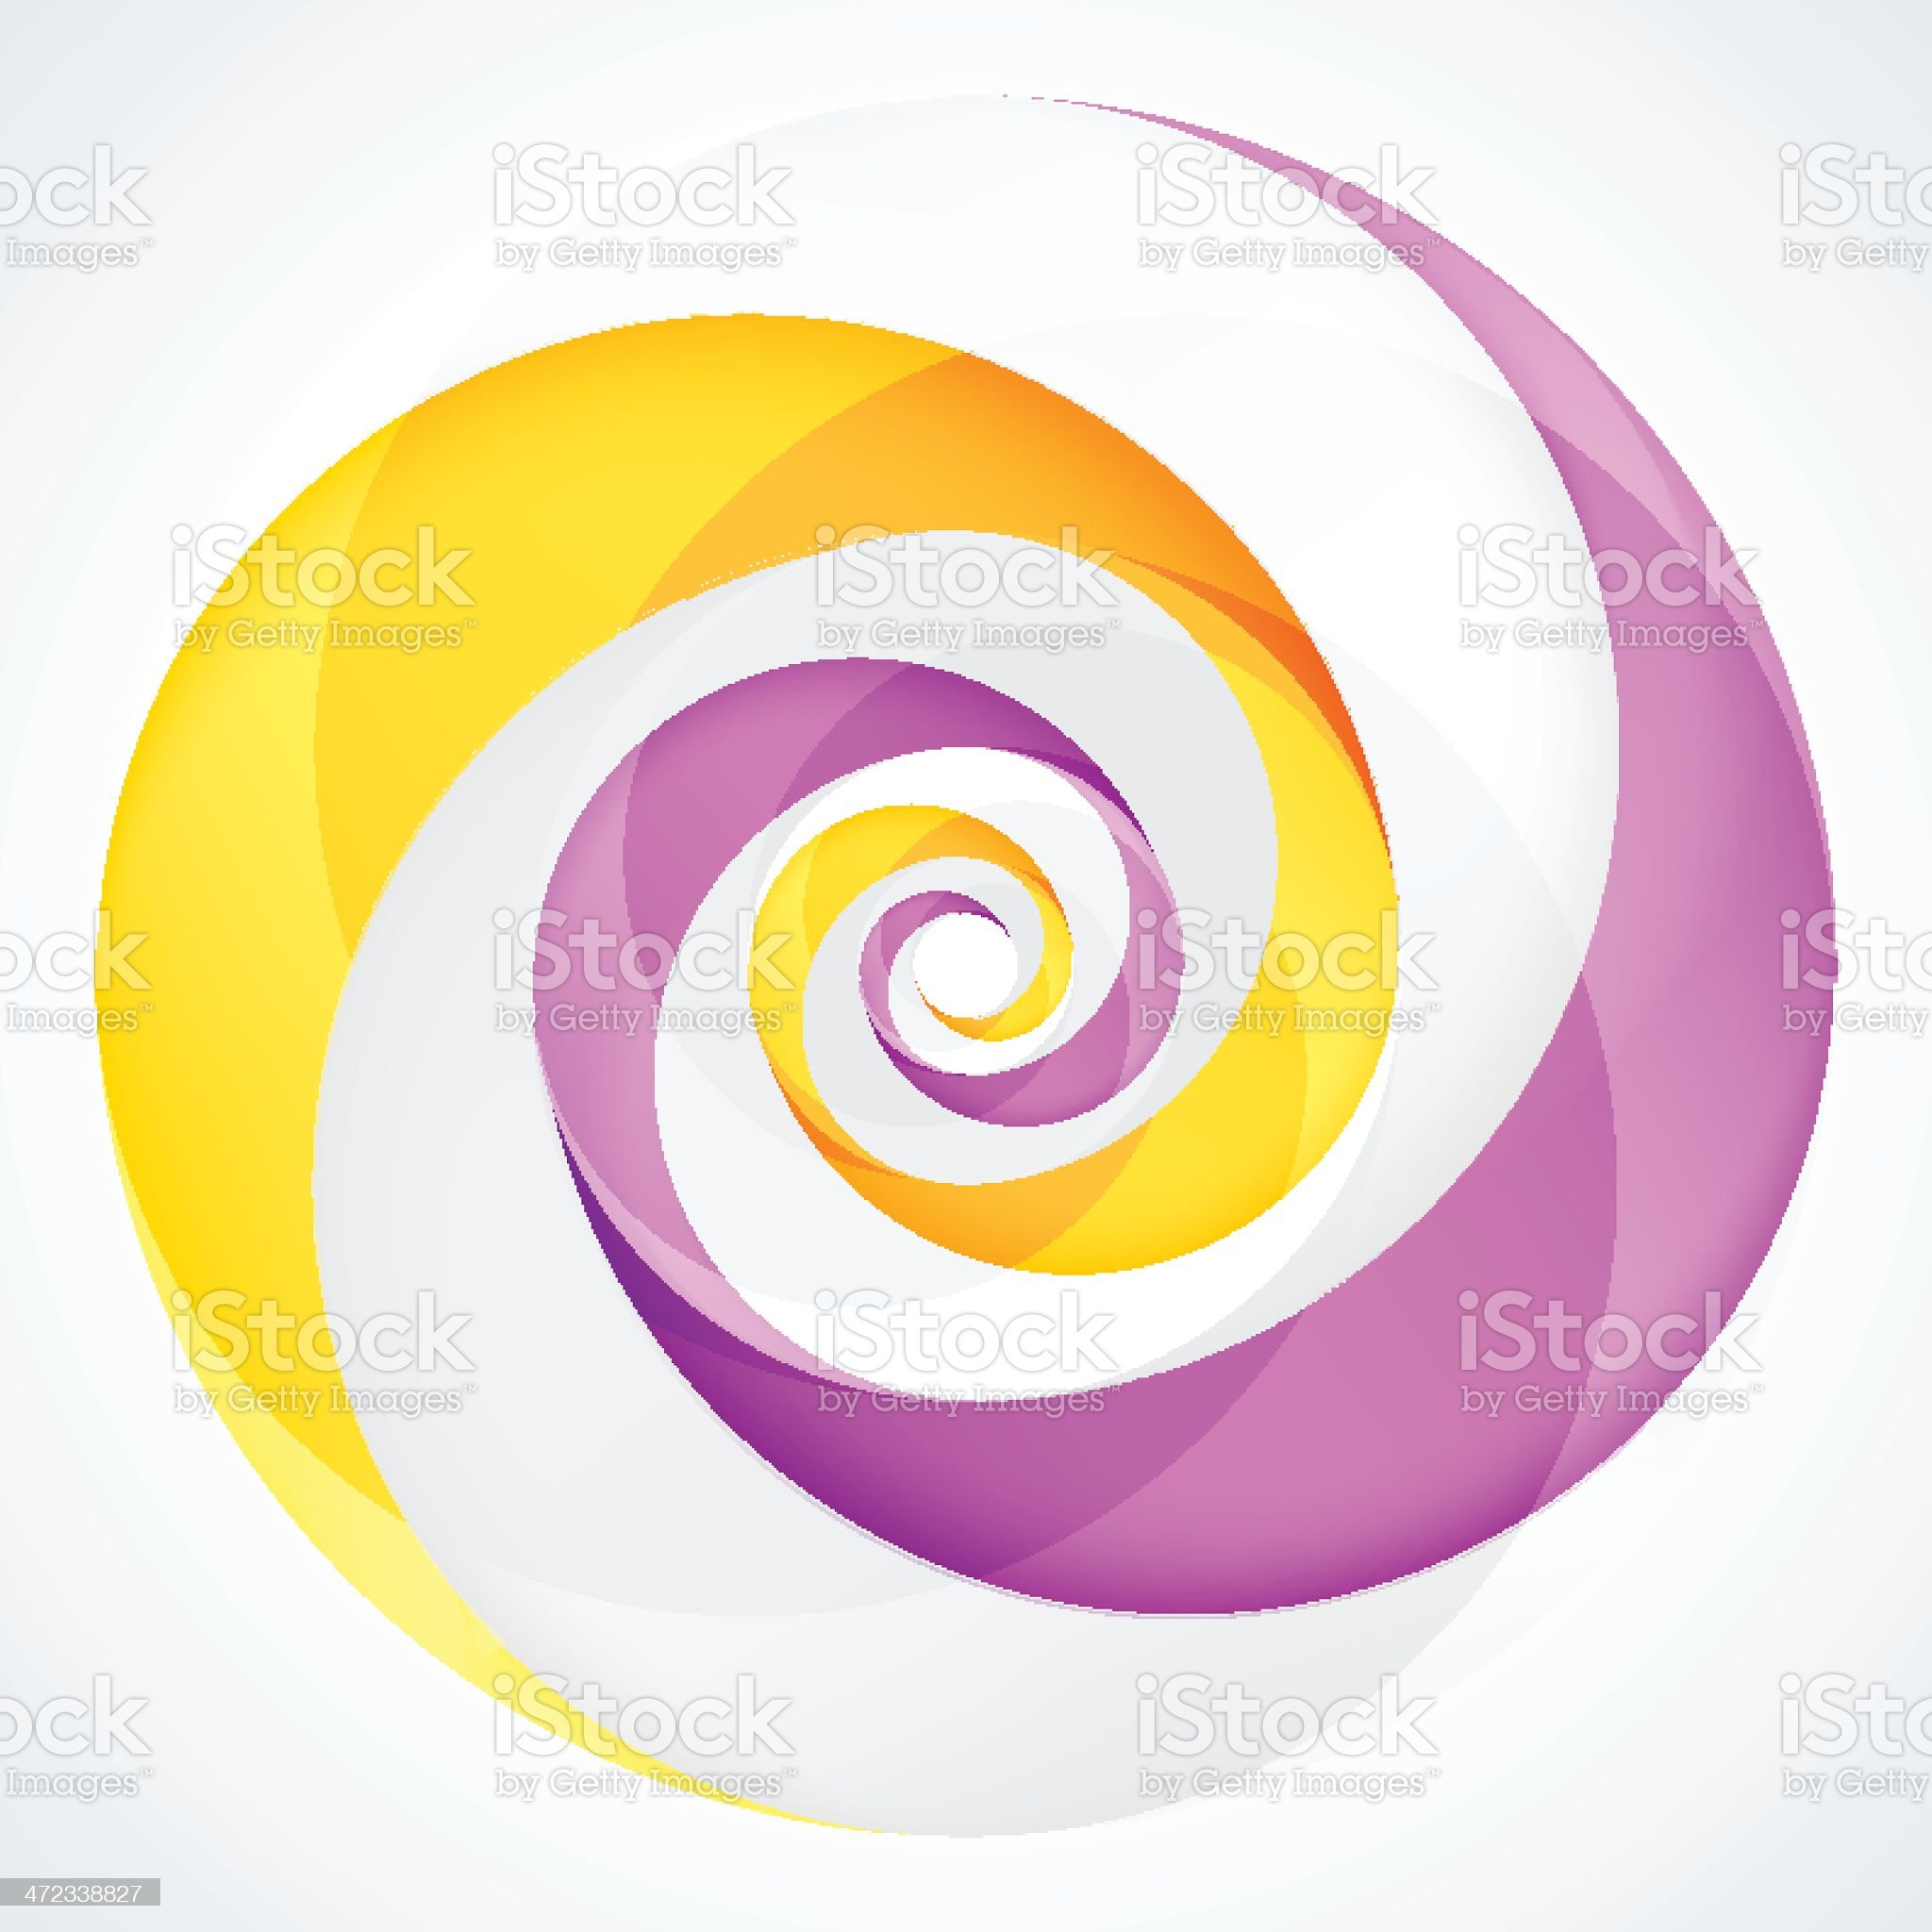 Abstract Circular Swirl Logo Design Element royalty-free stock vector art